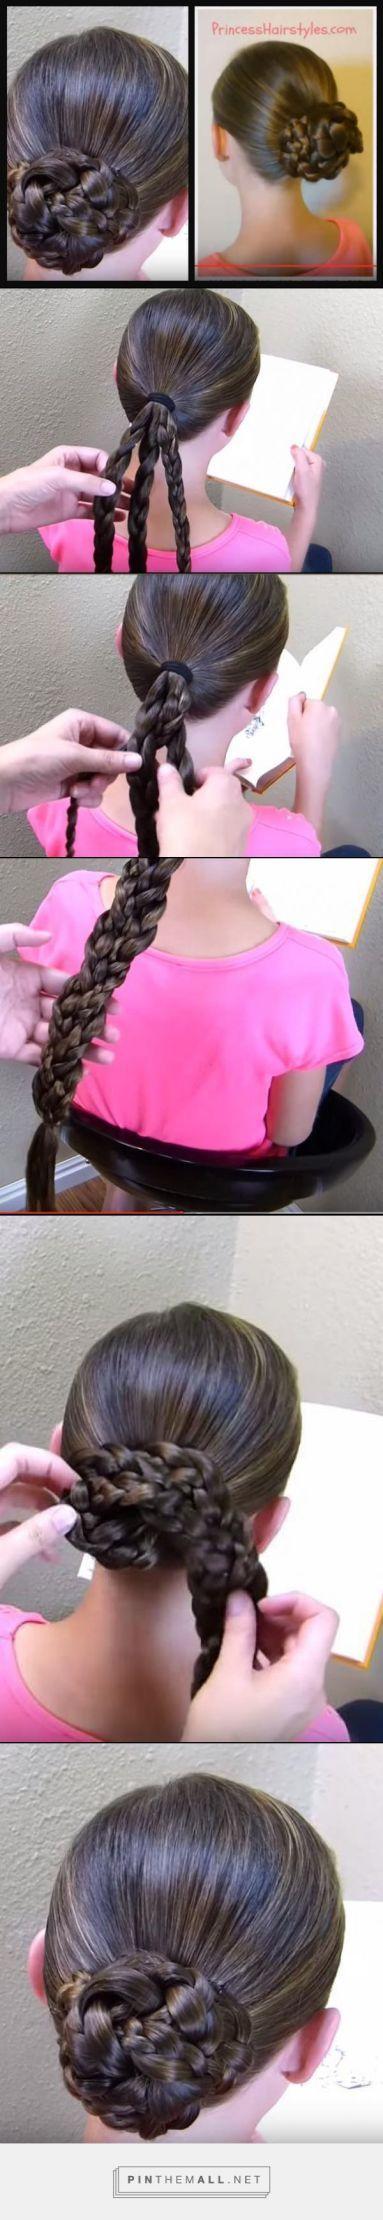 Easy braids hairstyles pinterest braid hairstyles hair